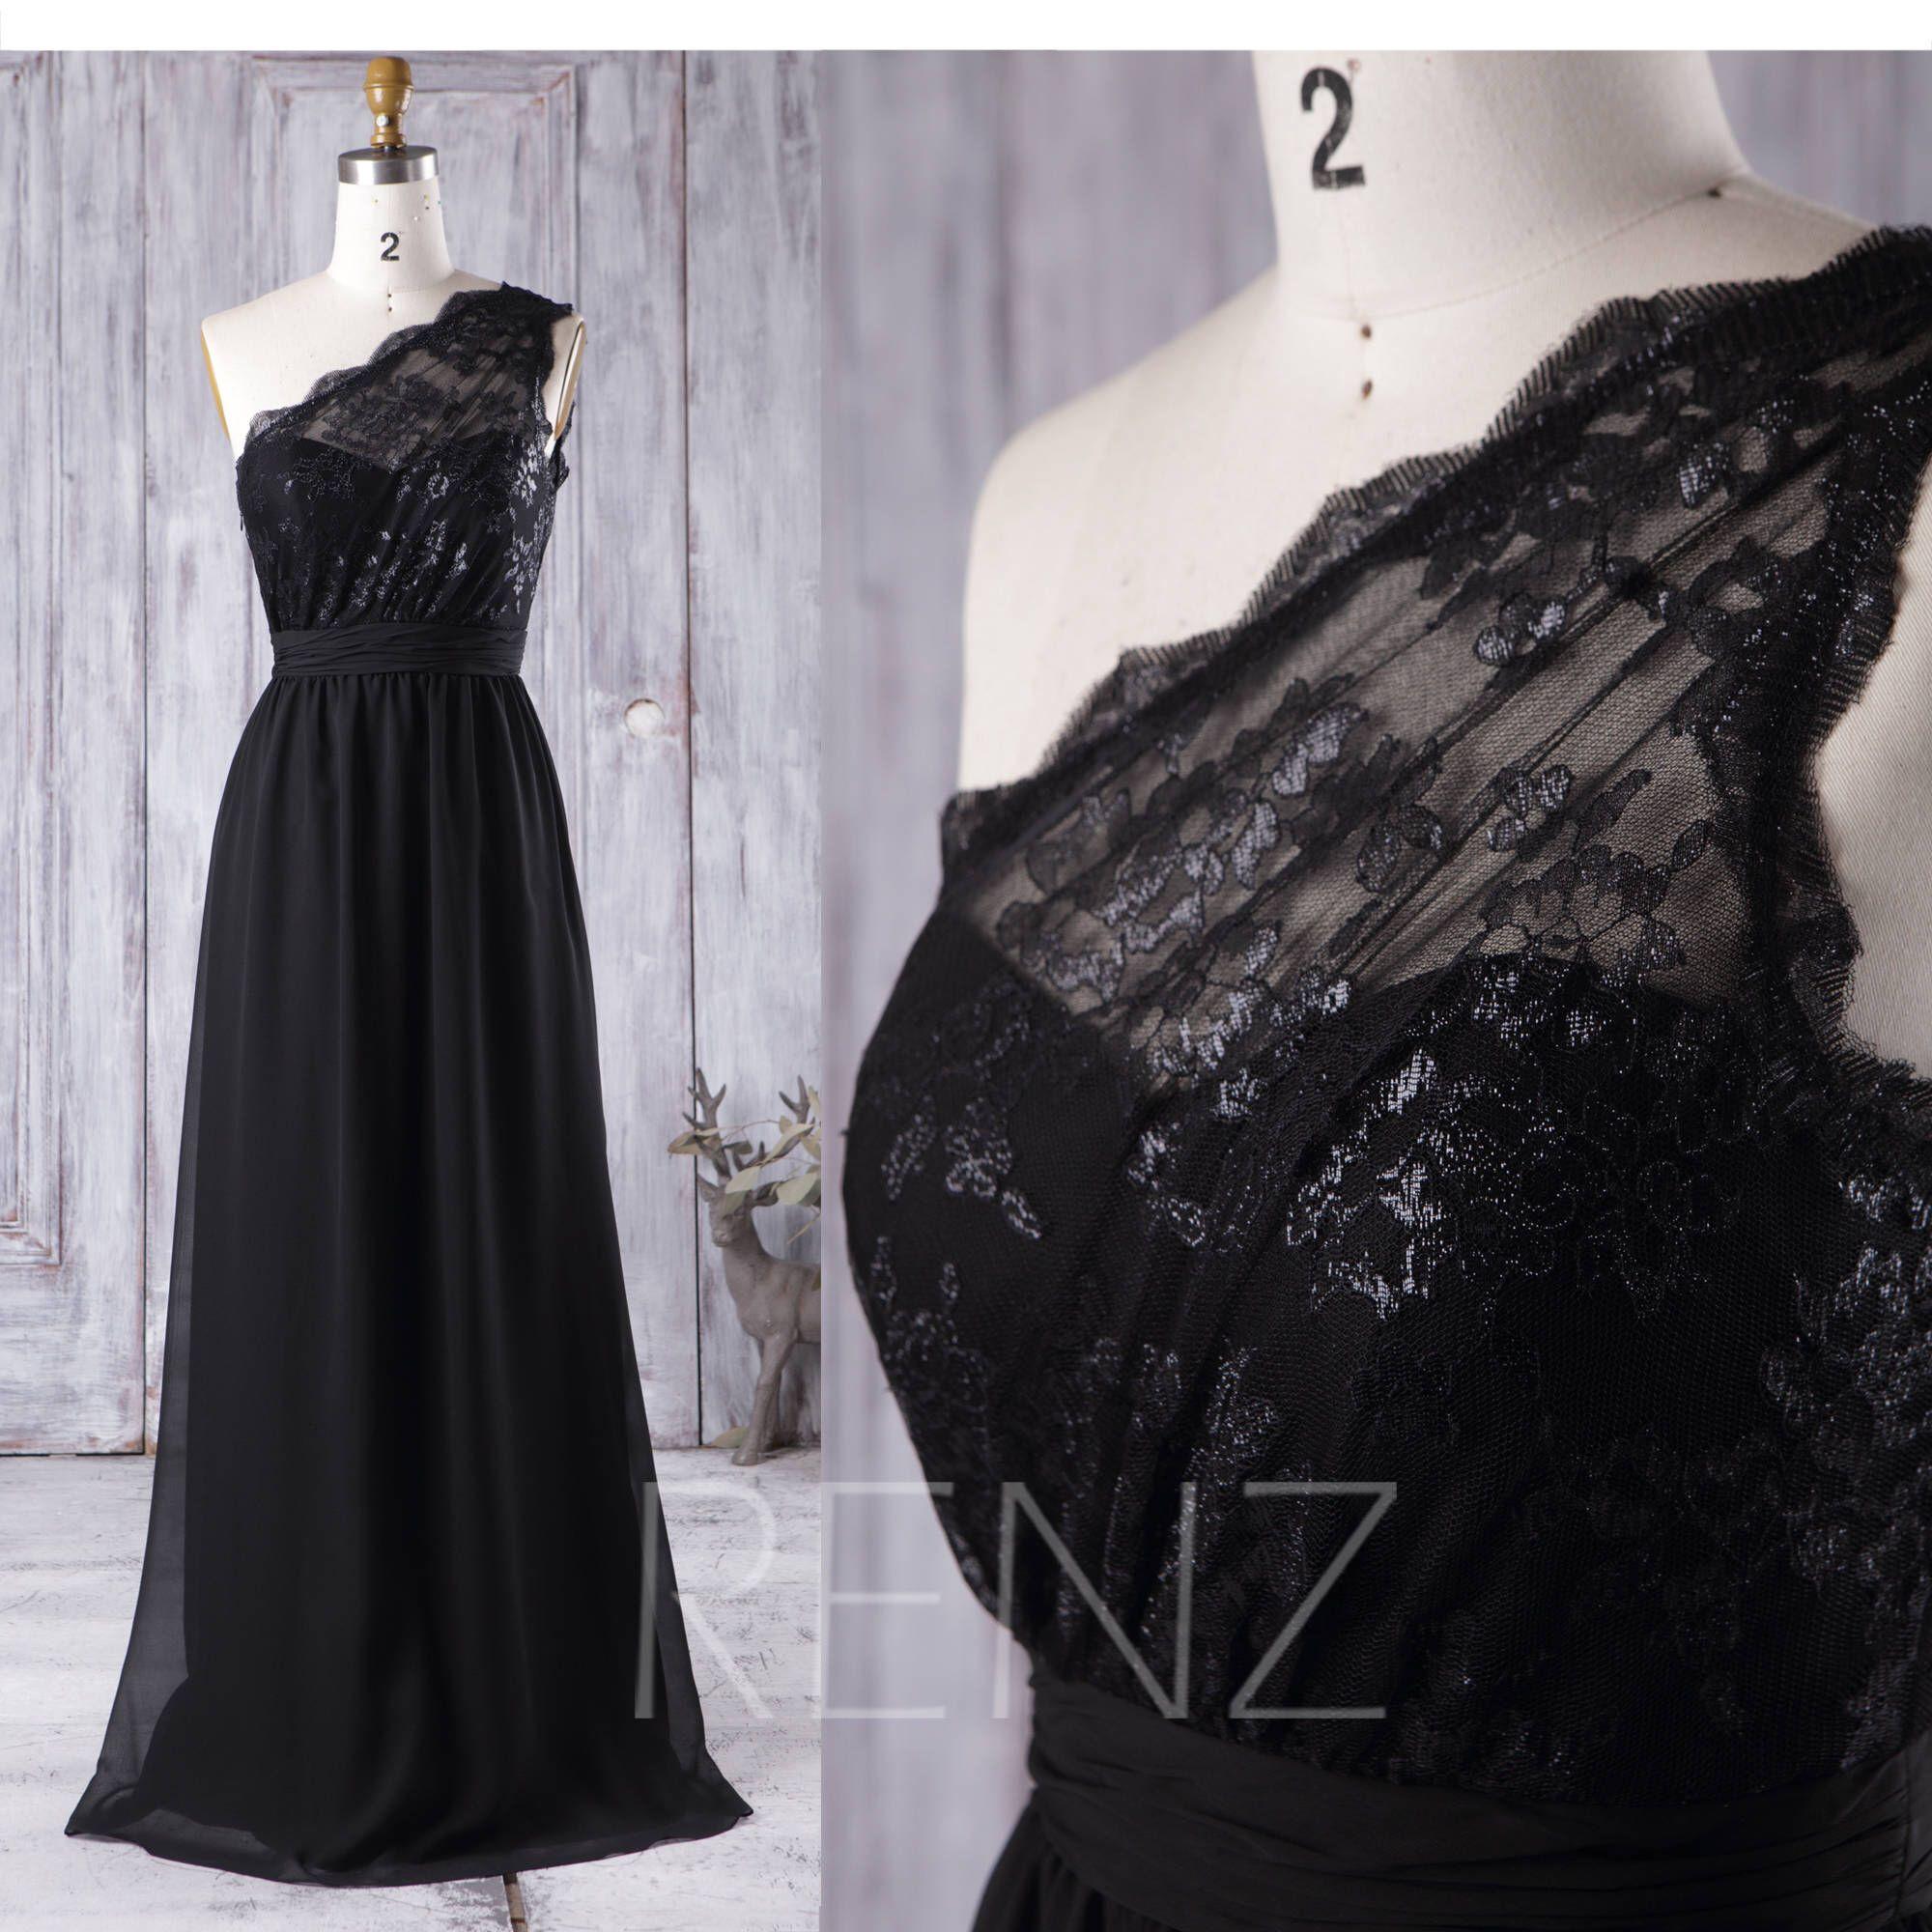 Black Chiffon Bridesmaid Dress One Shoulder Wedding Dress Etsy Trendy Dresses Formal Formal Dresses For Women Black Chiffon Bridesmaid Dresses